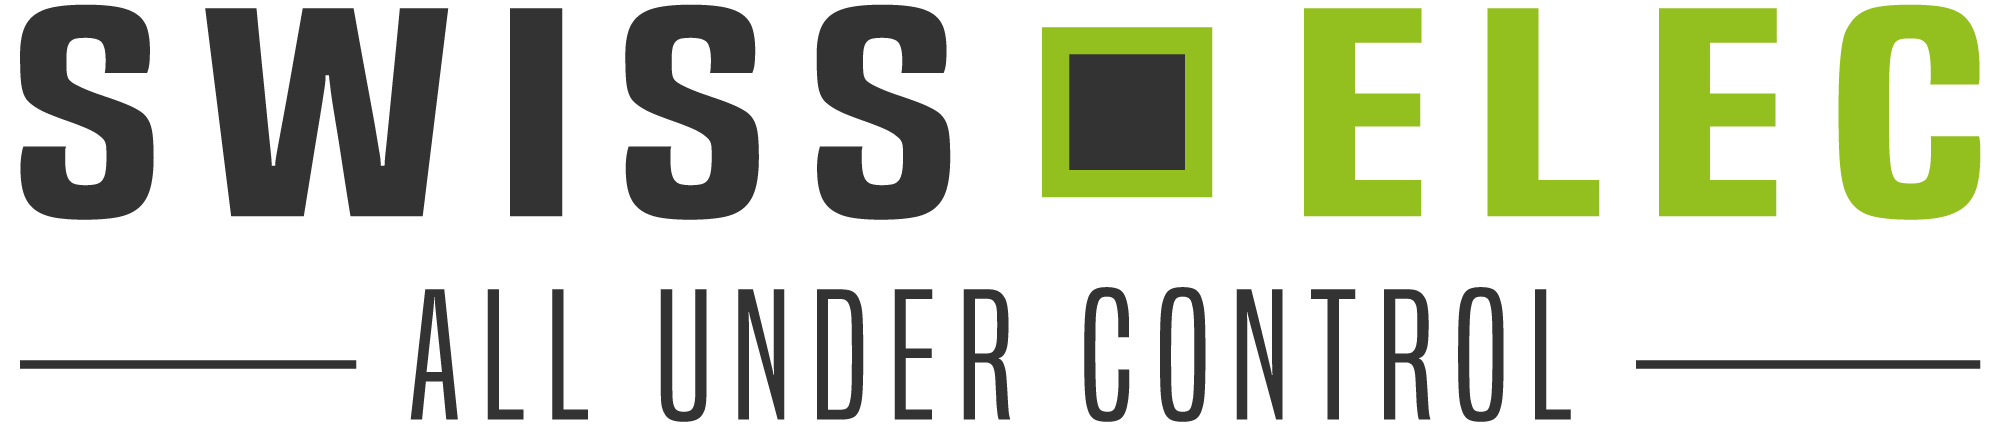 Swisselec-control